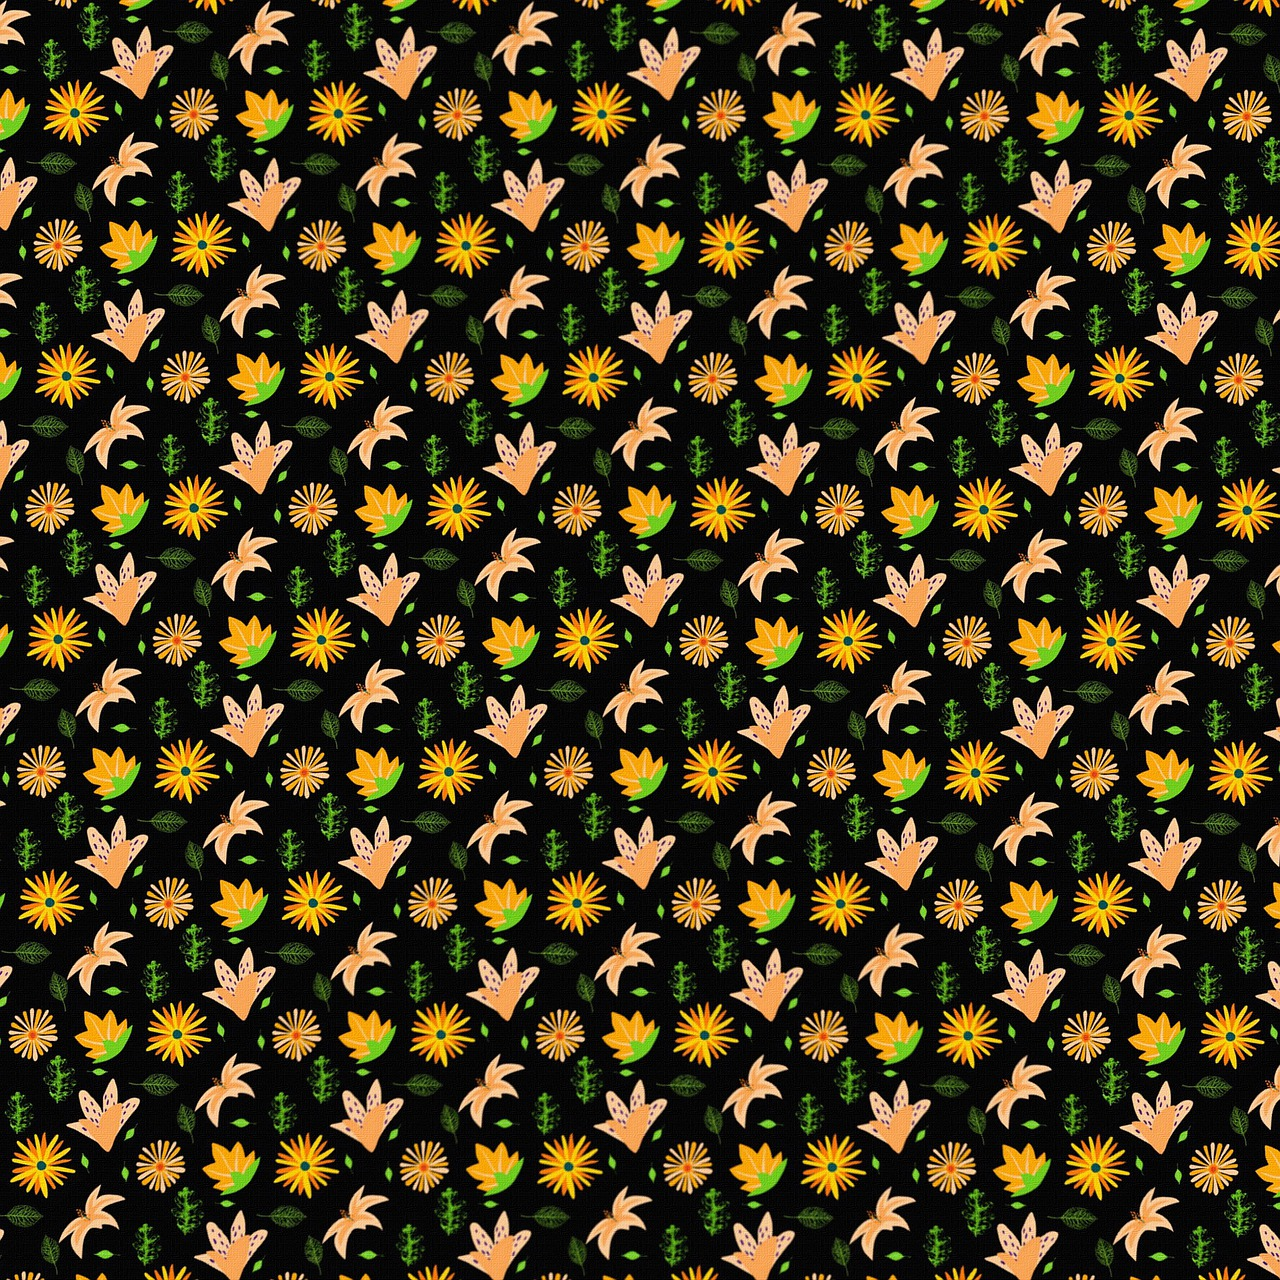 Retro Floral Background Flower Free Image On Pixabay